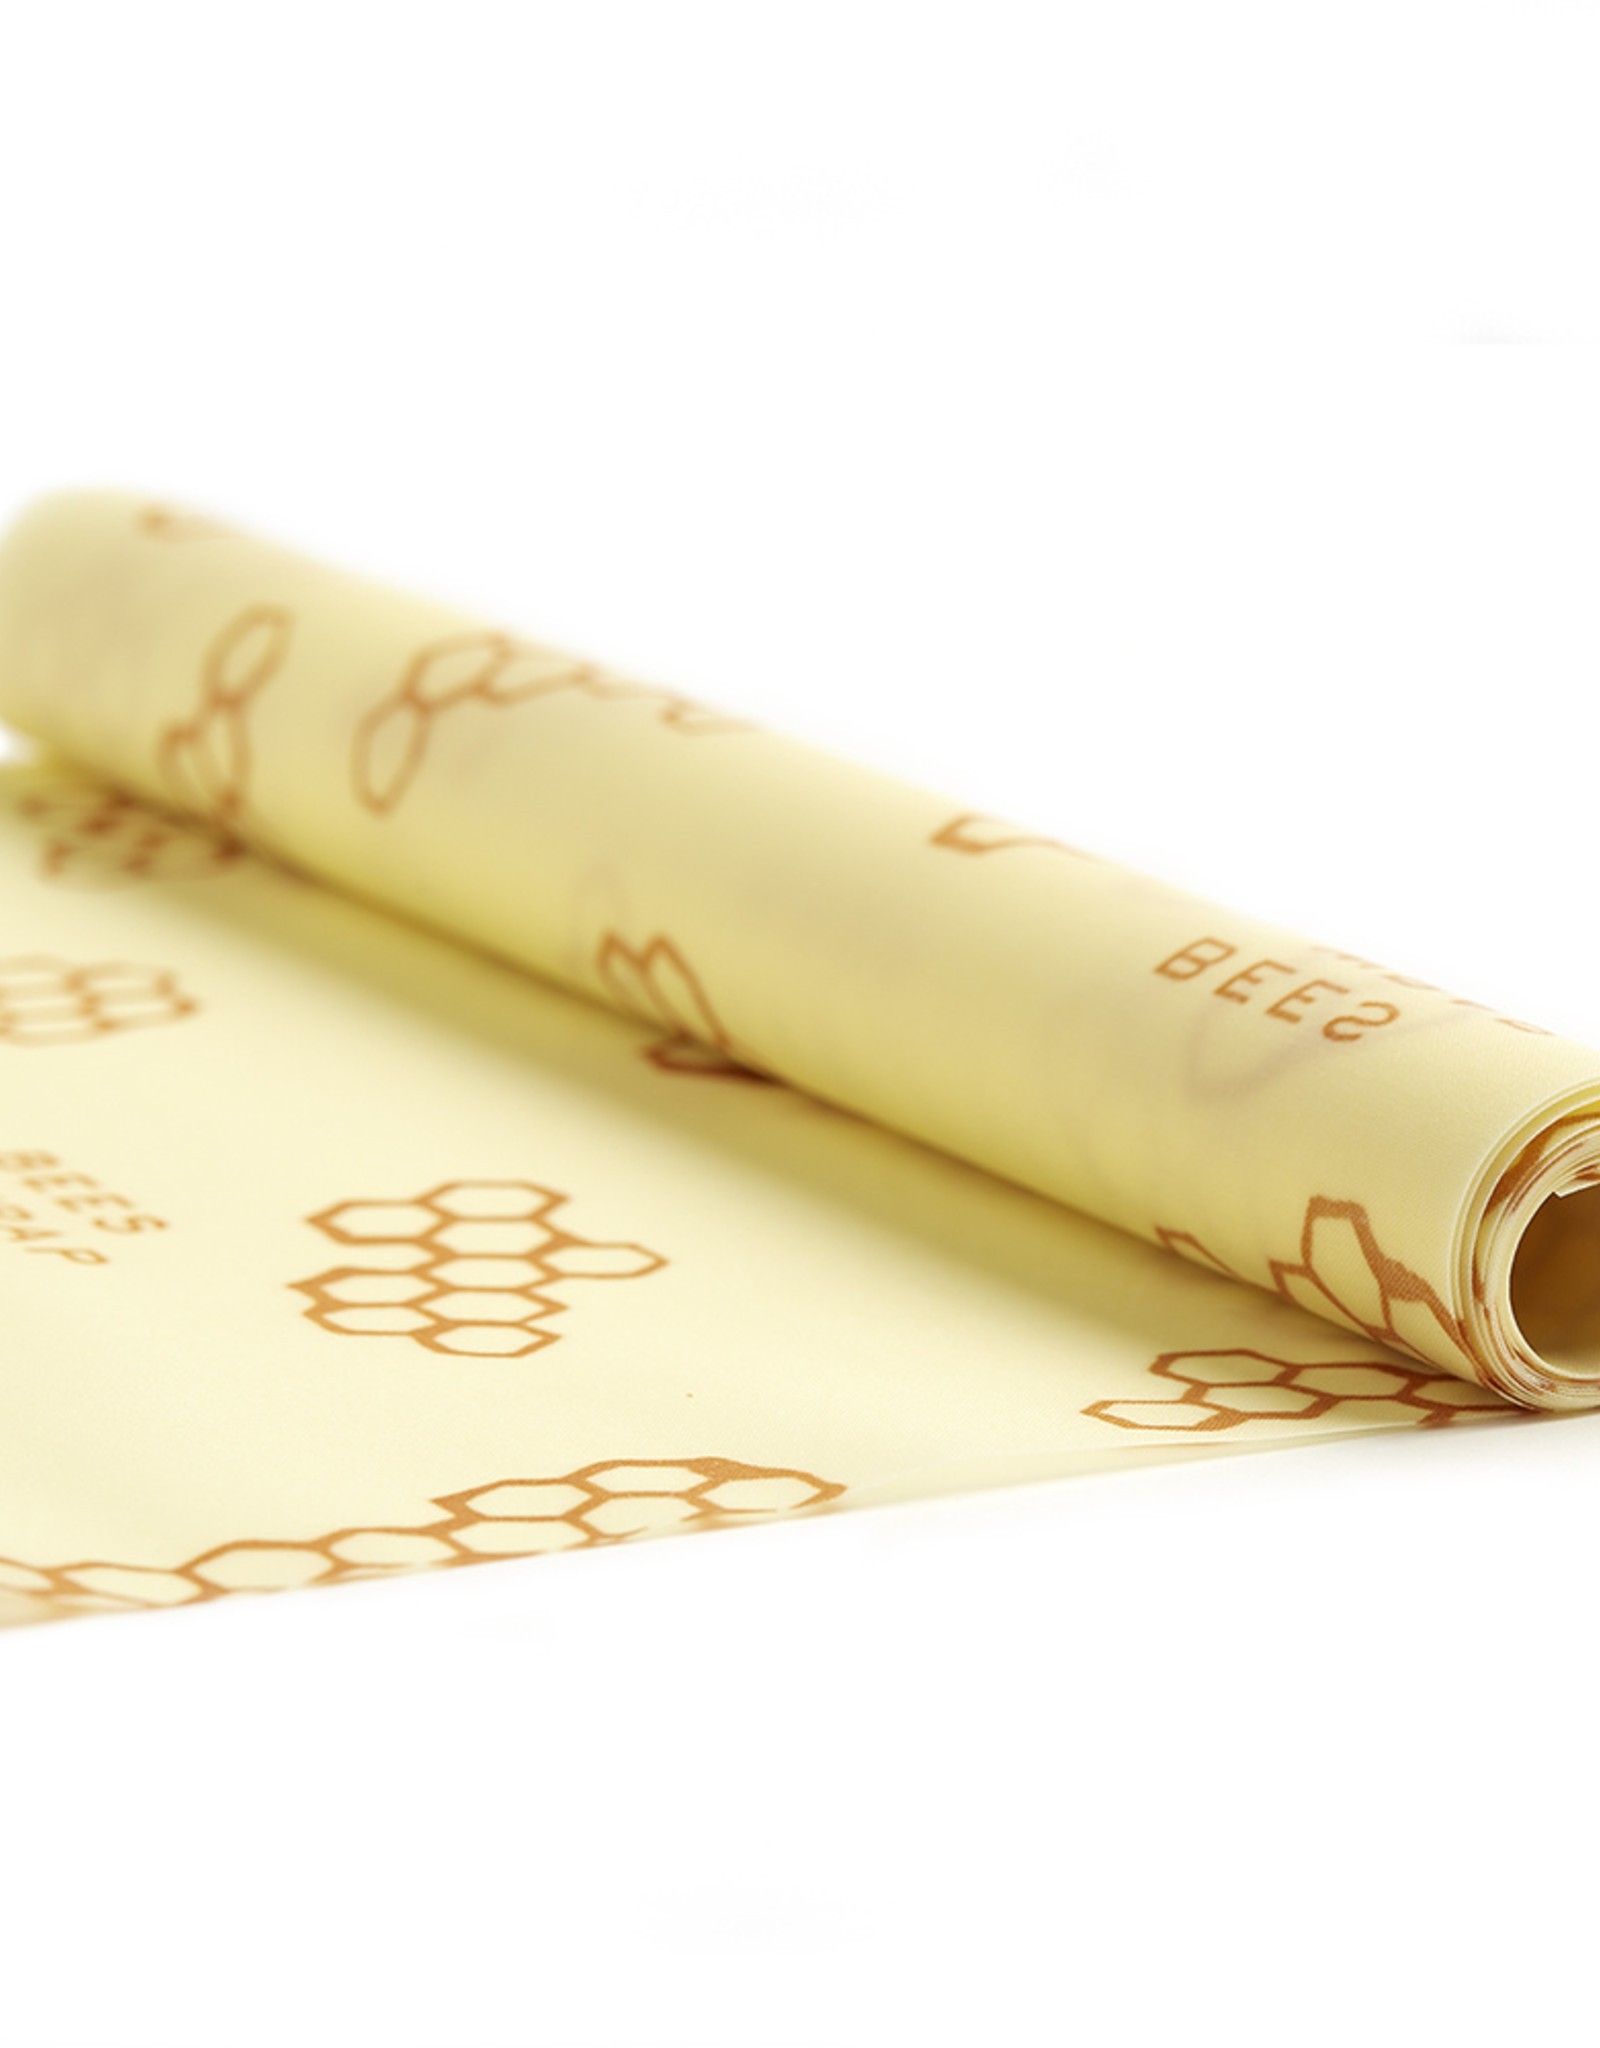 Bee's Wrap Bee's wrap roll